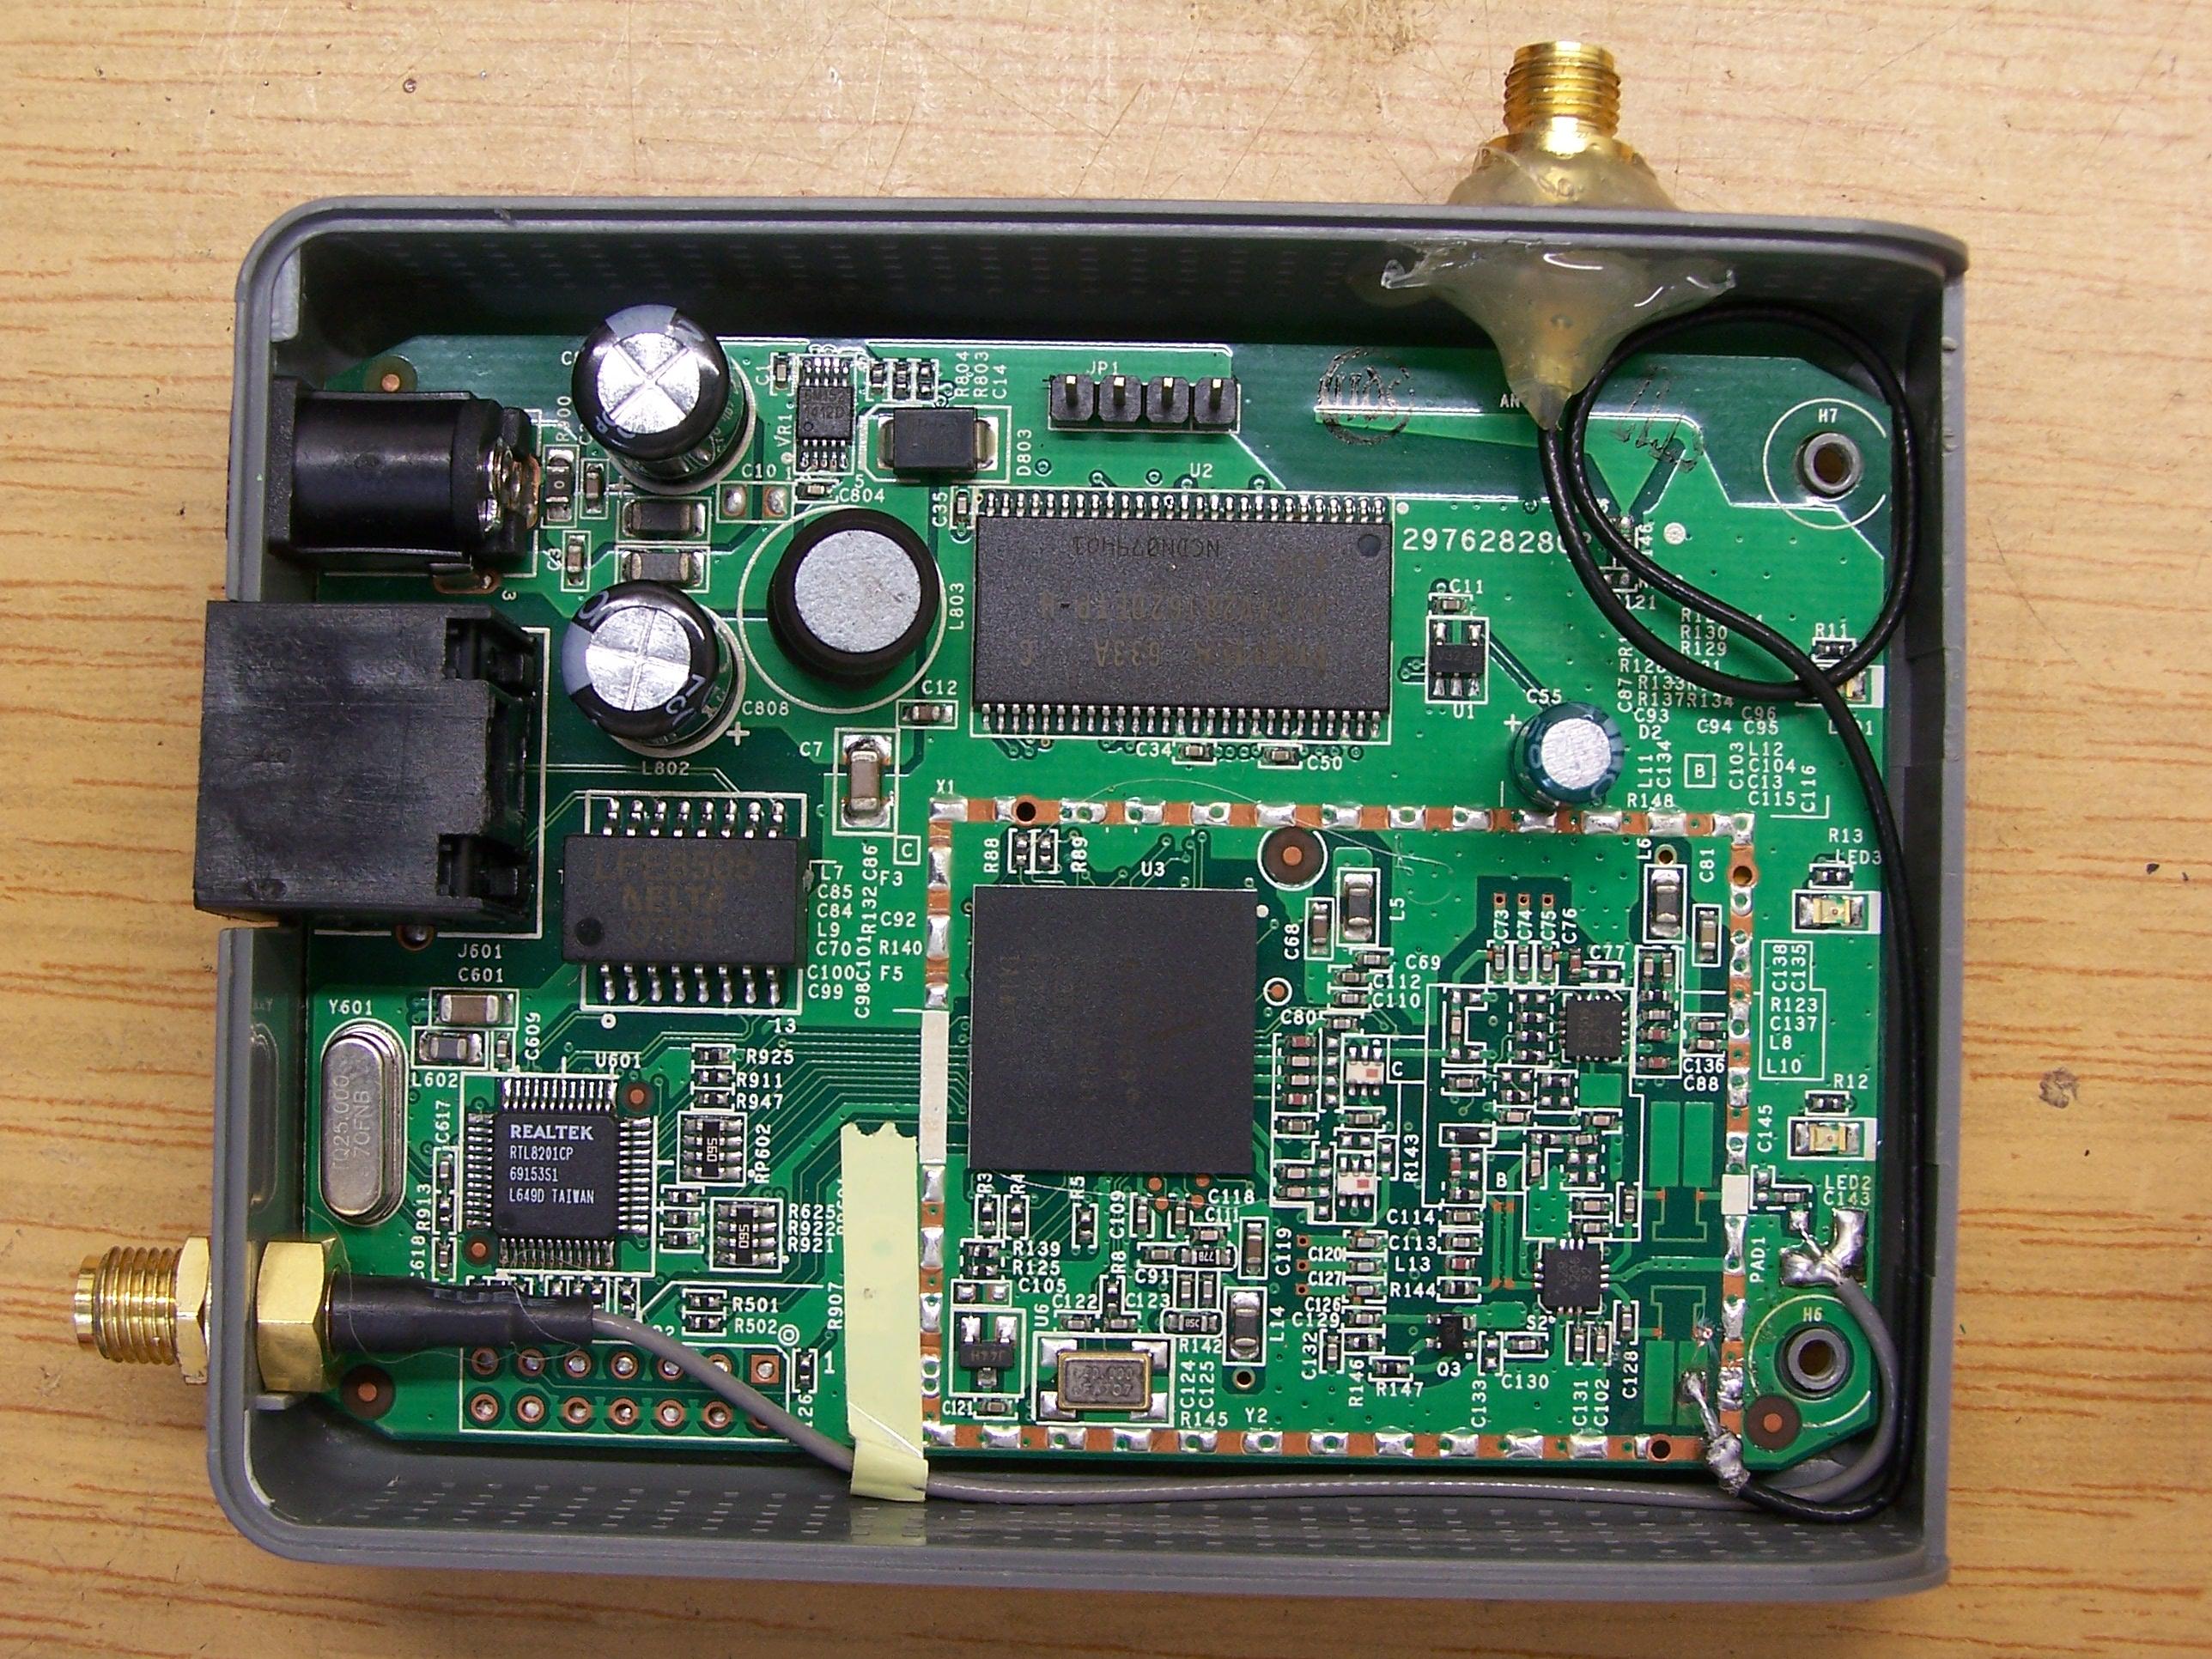 fon2200-2nd-antenna-mod.jpg